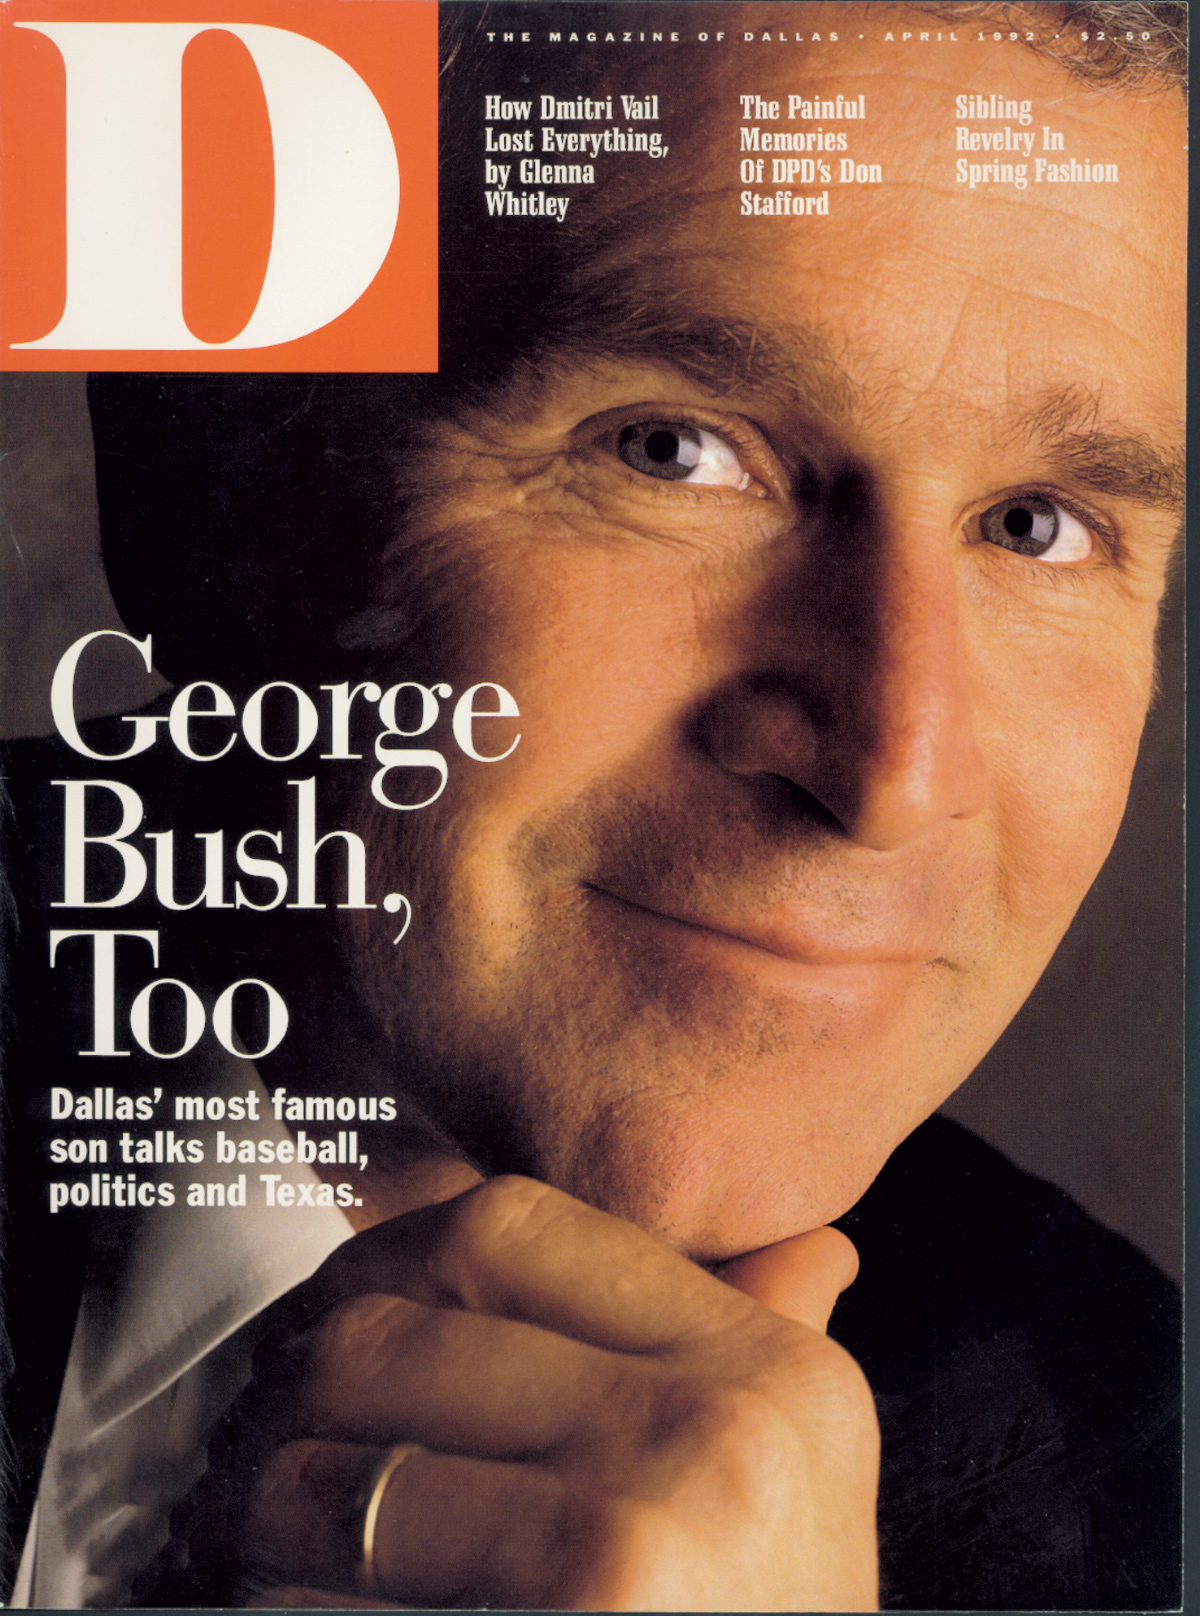 April 1992 cover